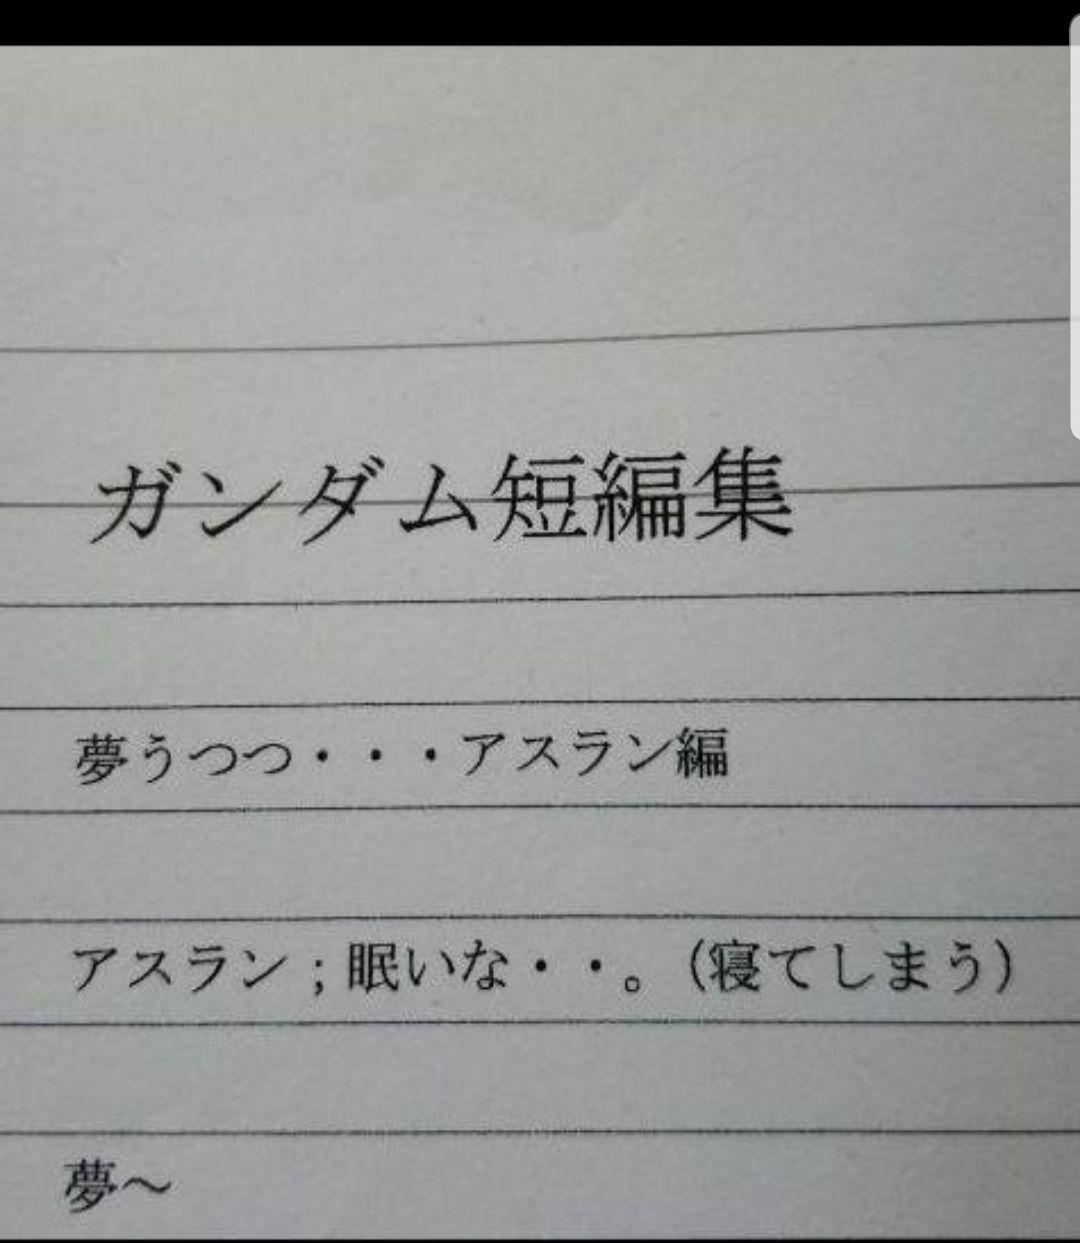 名探偵コナン夢小説短編集